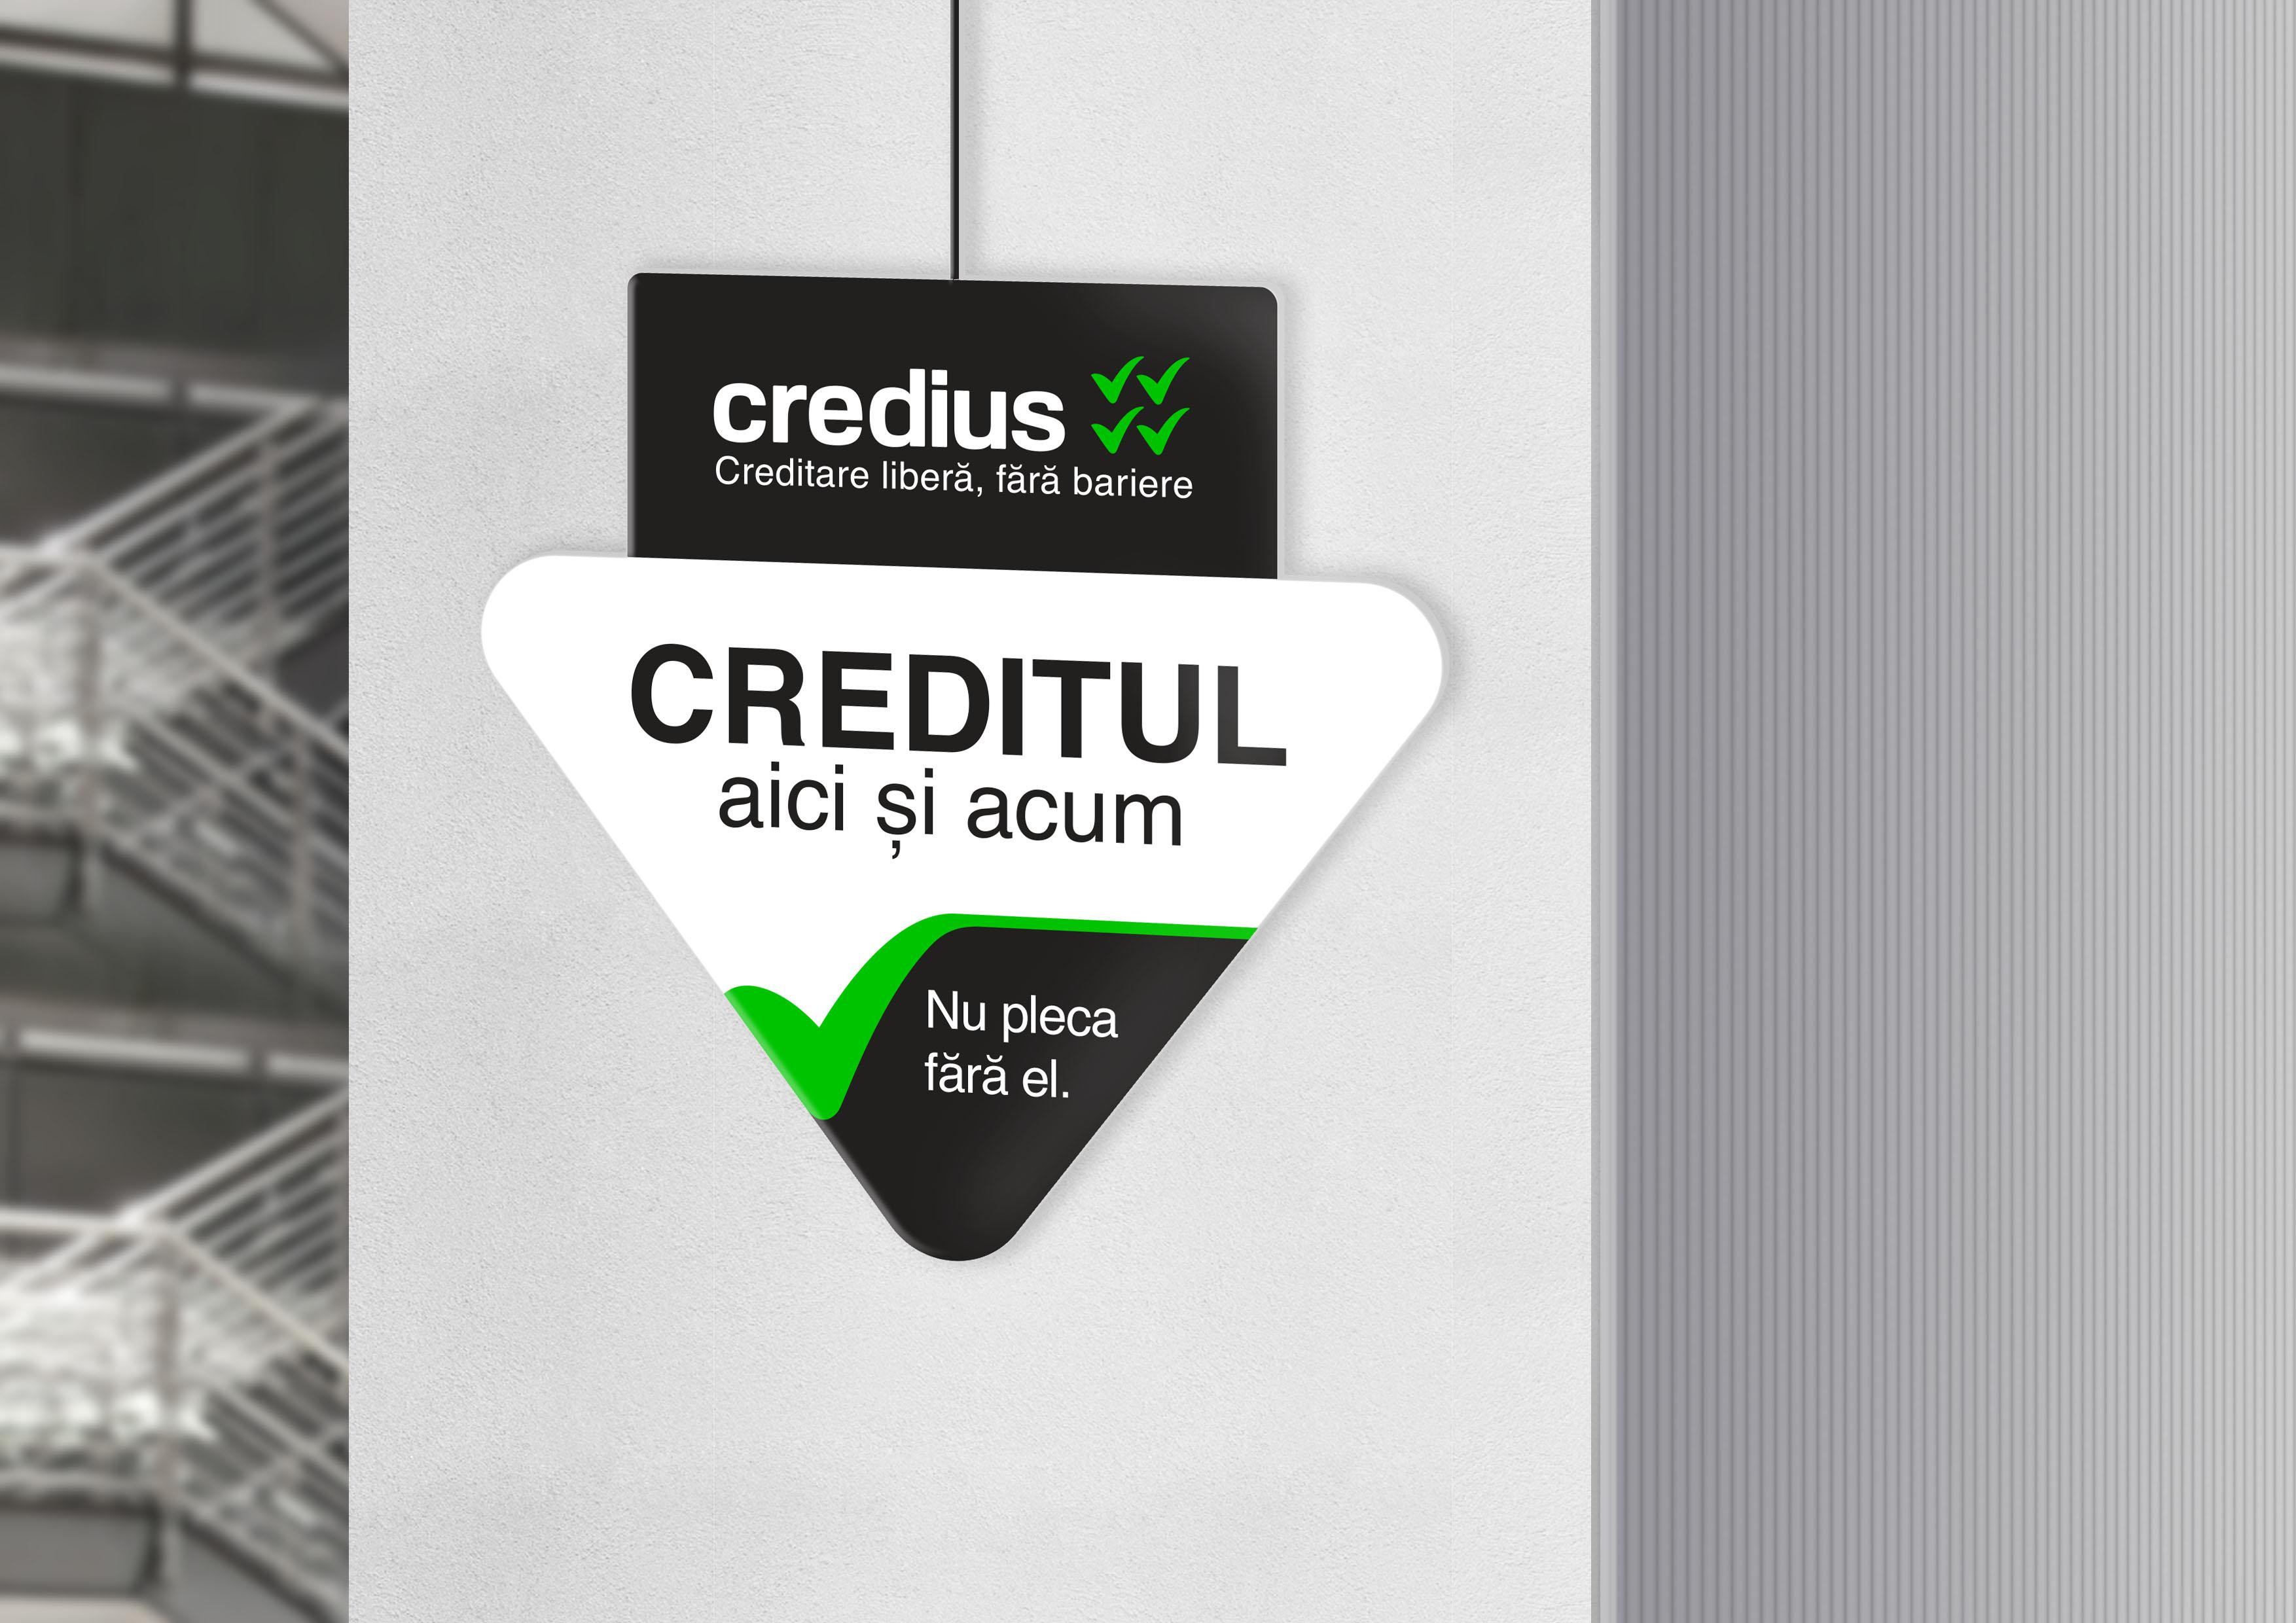 credius branding interior triangle